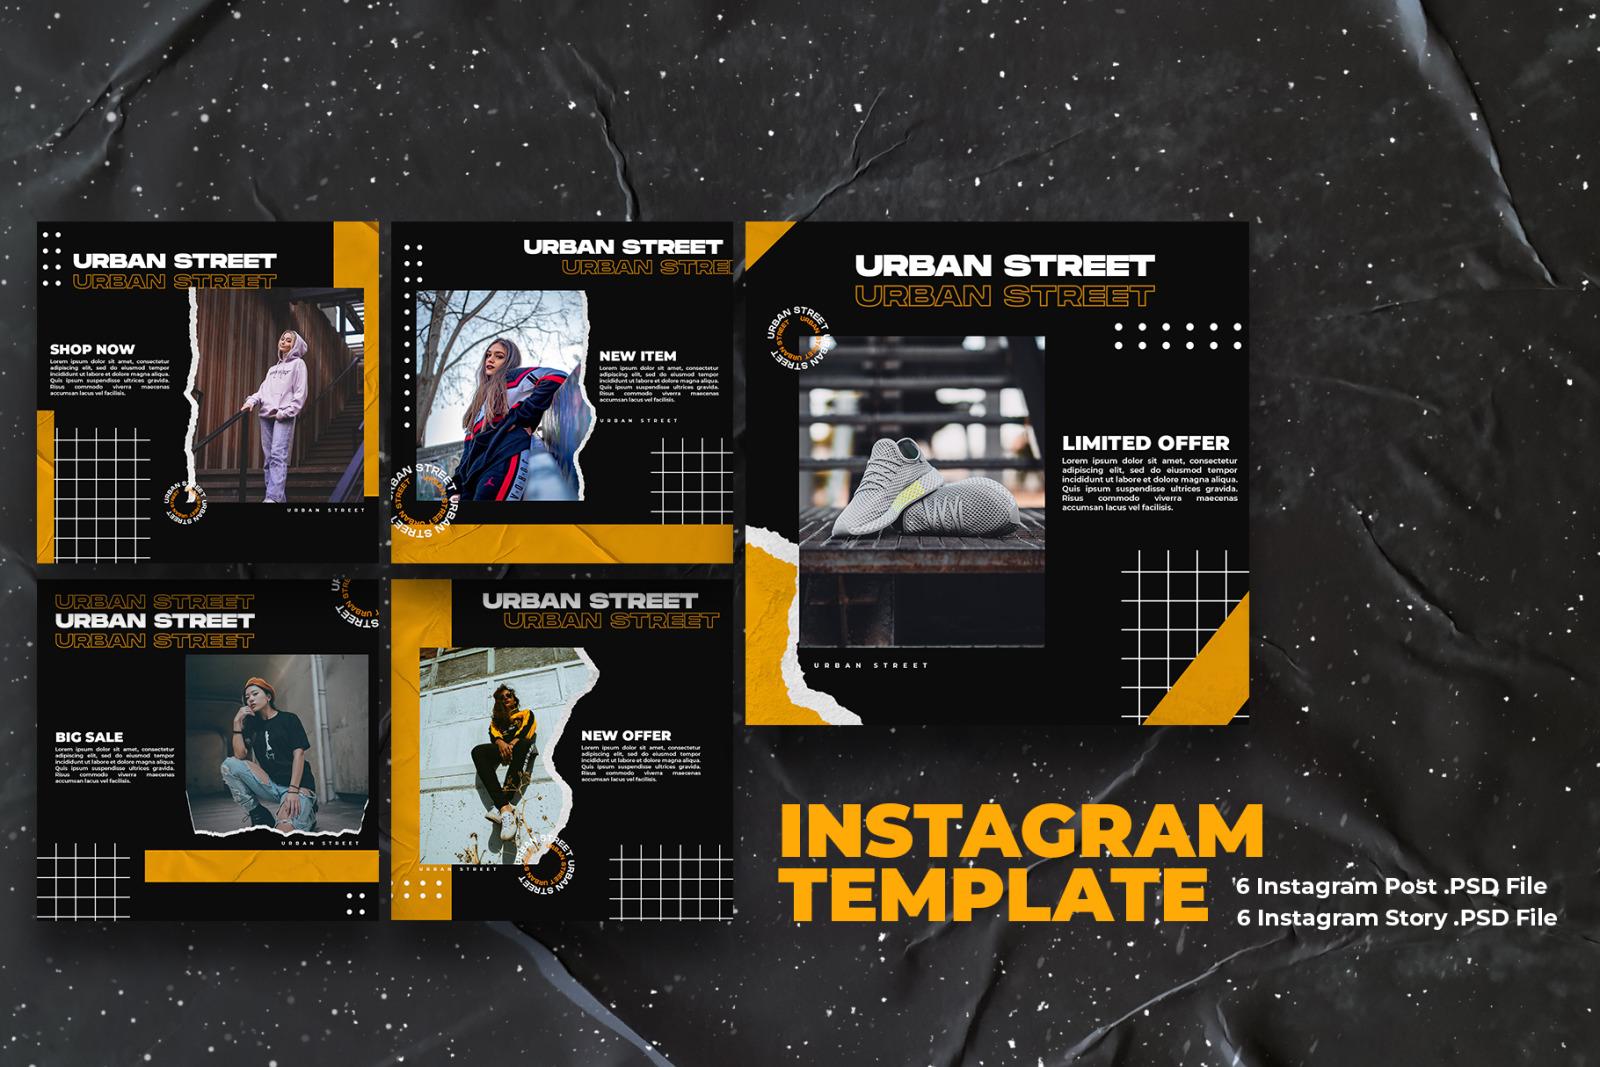 Urban Street - Instagram Template